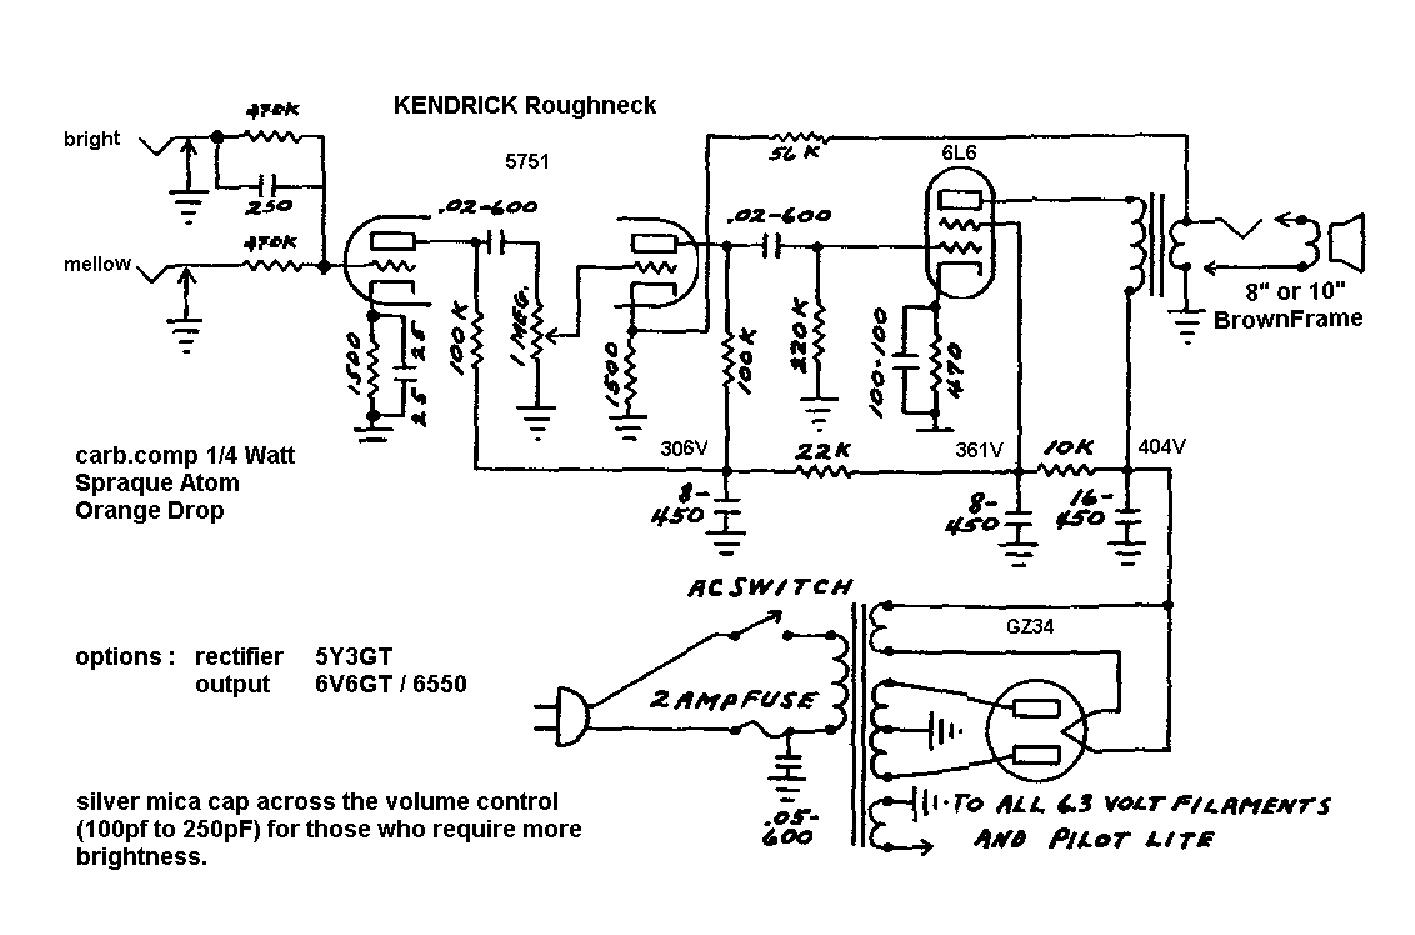 Kendrick Amp Schematics Books Of Wiring Diagram 32 Watt Stereo Amplifier Circuit Pictures To Pin On Pinterest Roughneck Service Manual Download Eeprom Rh Elektrotanya Com